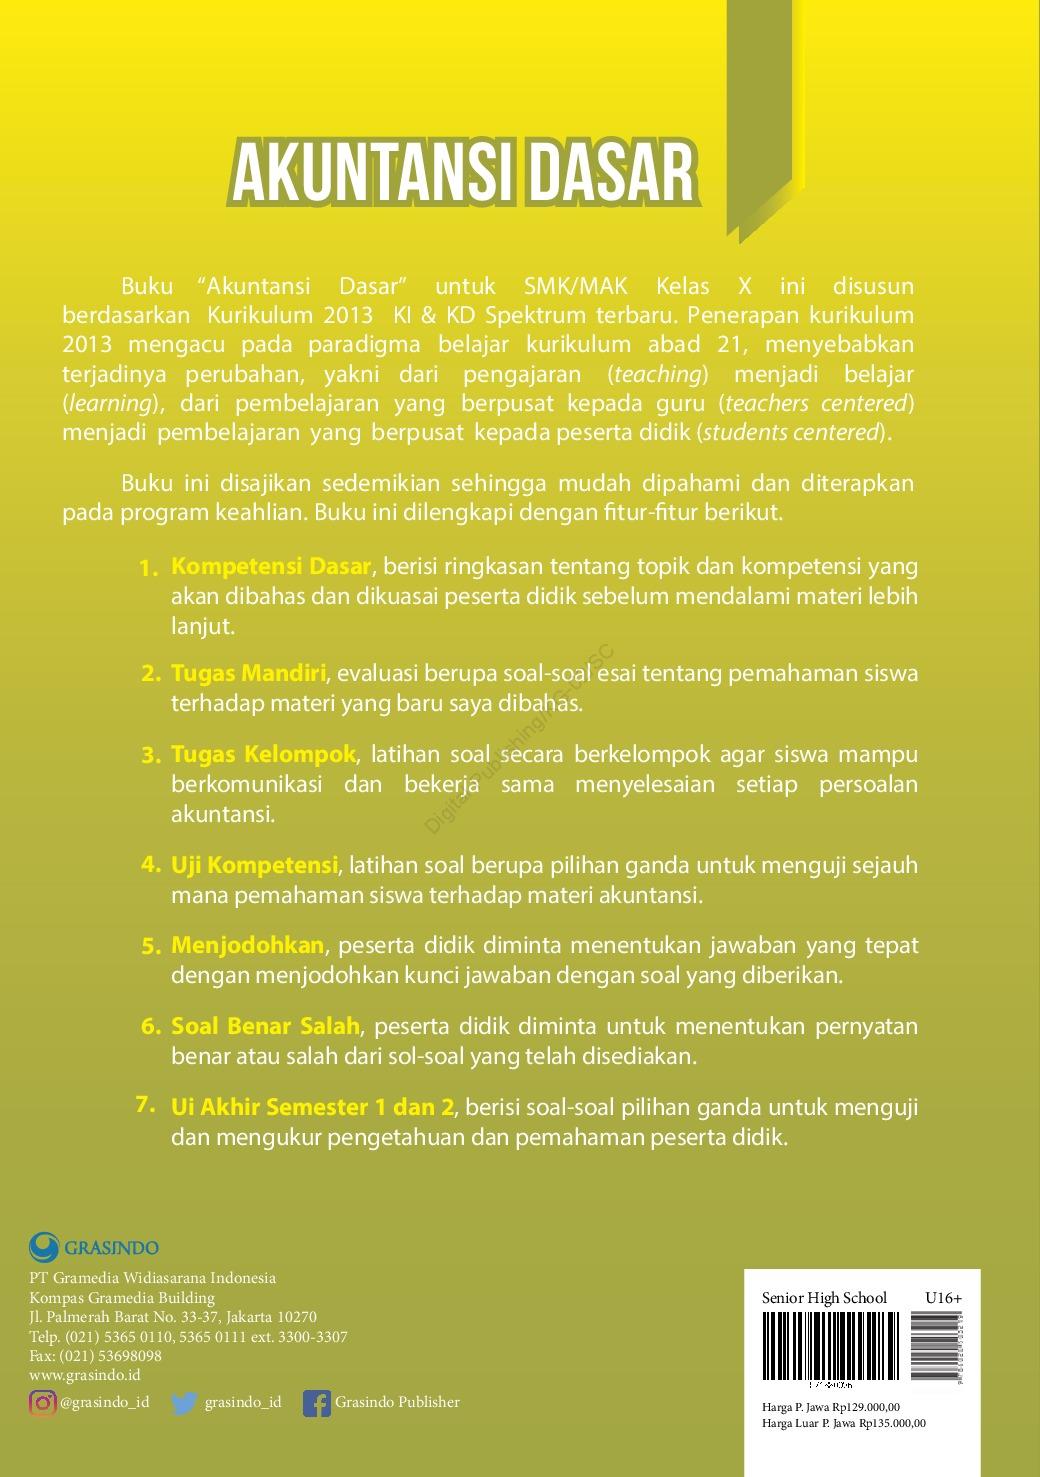 Jual Buku Akuntansi Dasar Untuk Smk Mak Kelas X Oleh Sri Hartati S Pd M Pd Dan Dra Yatimatun Nafi Ah M M Gramedia Digital Indonesia